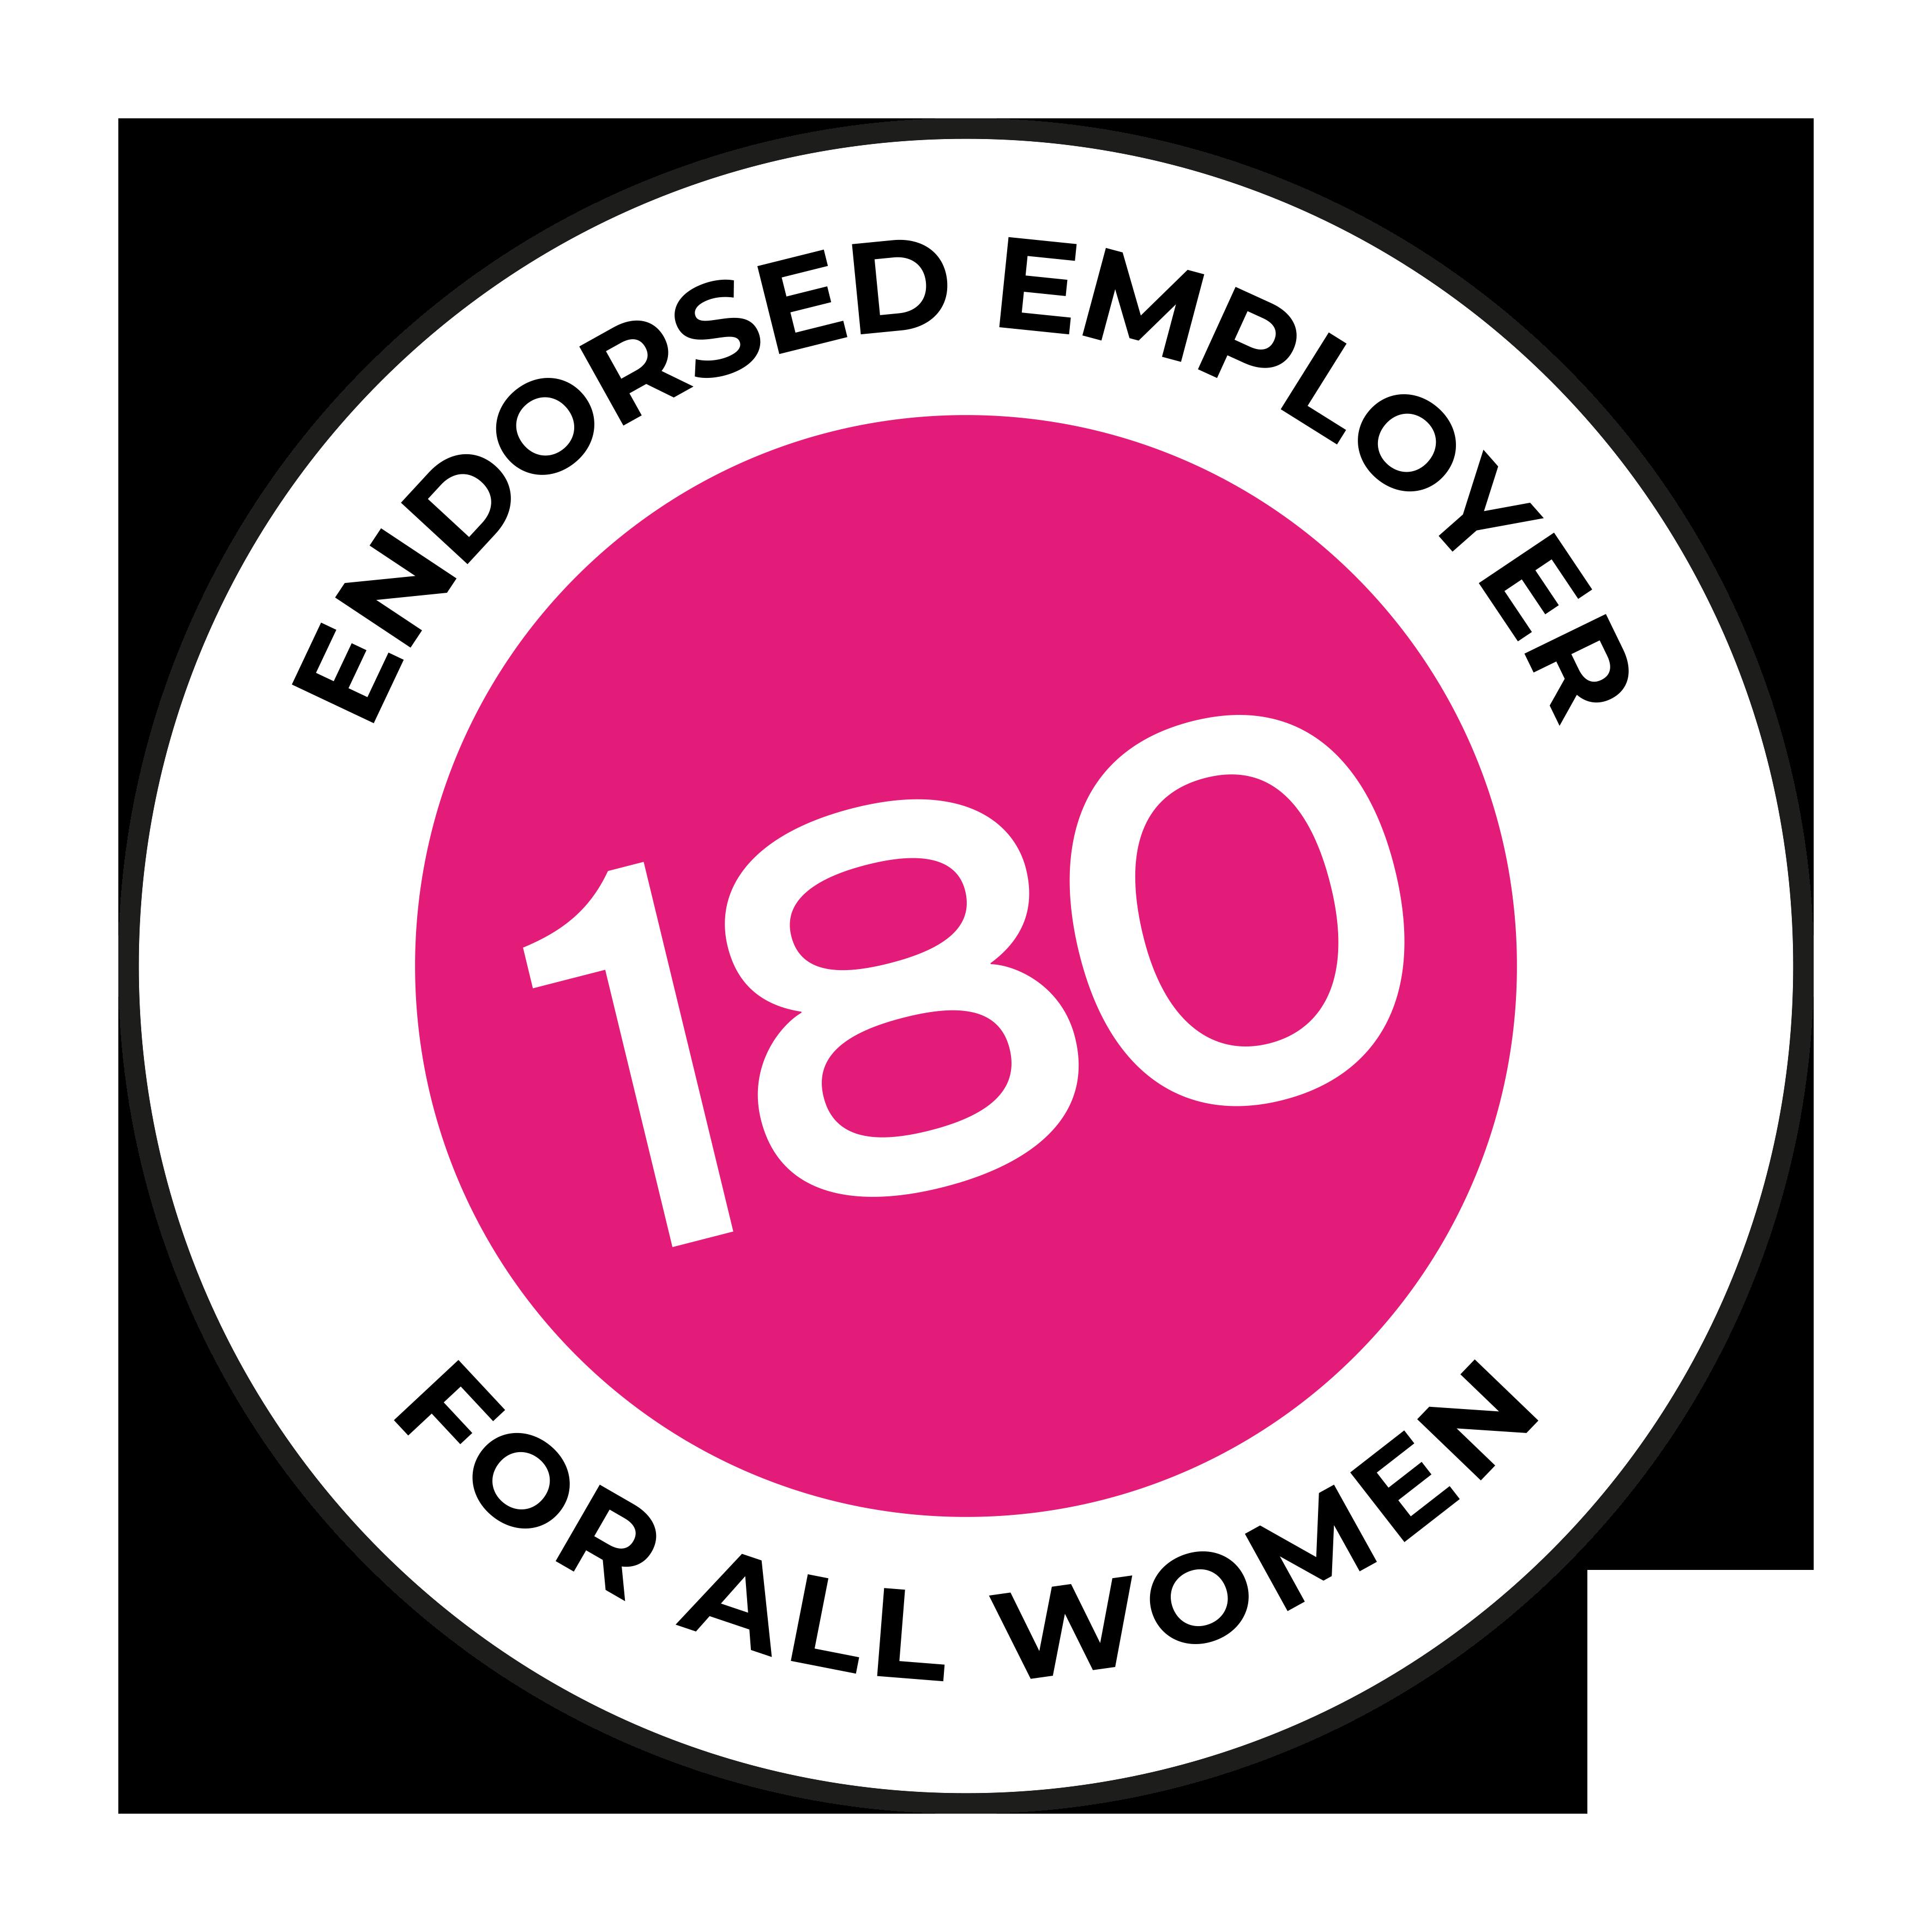 WORK180-Endorsed-Badge-no-date